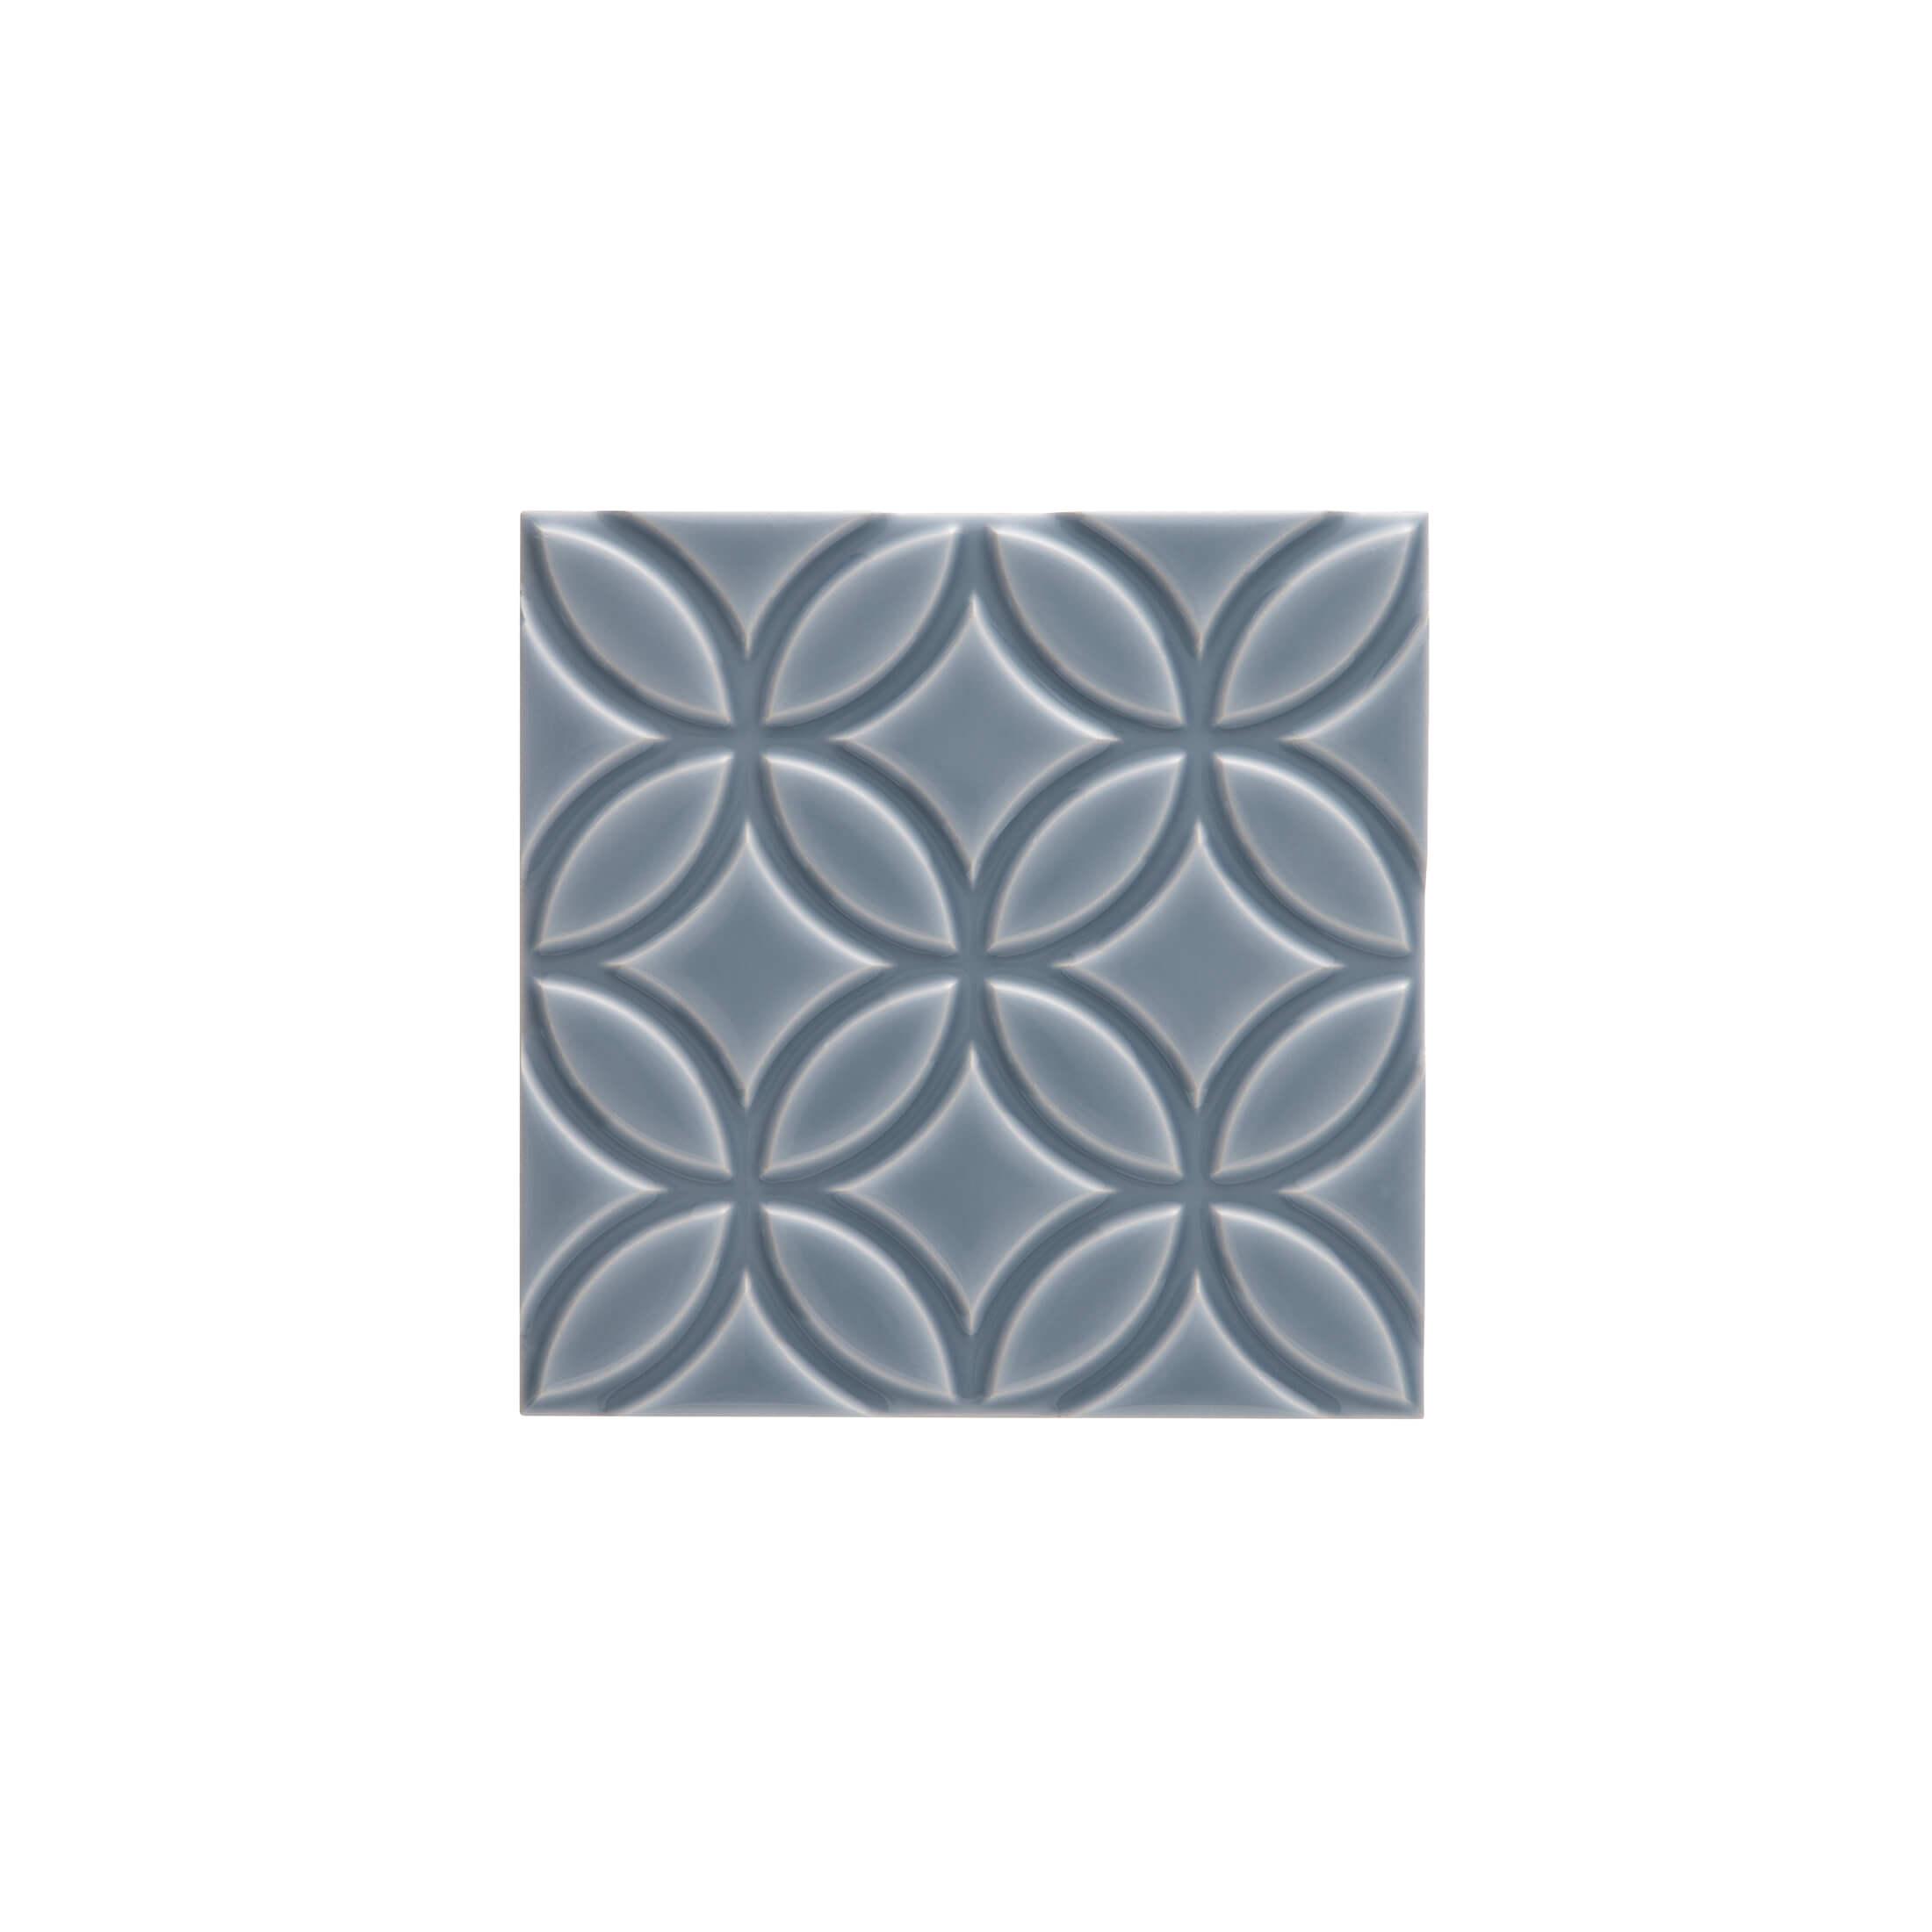 ADNE4143 - LISO BOTANICAL - 15 cm X 15 cm